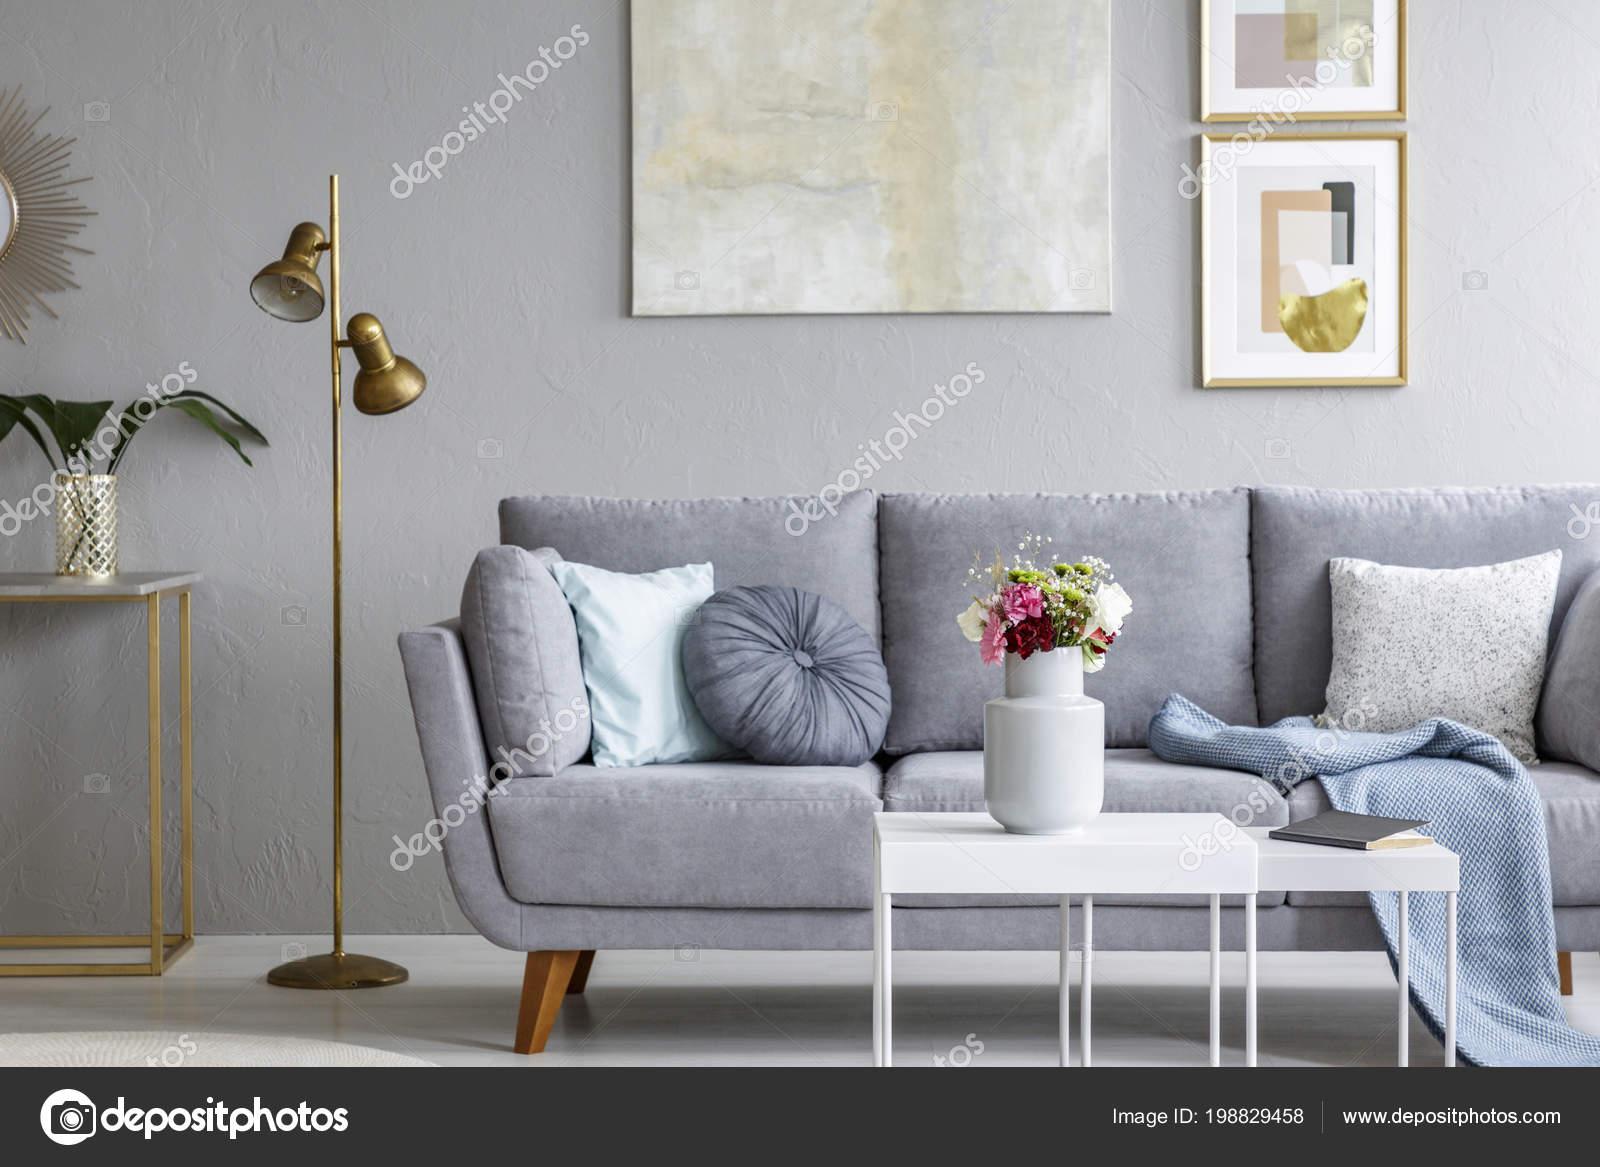 Gold Lamp Next Grey Sofa Modern Living Room Interior Poster